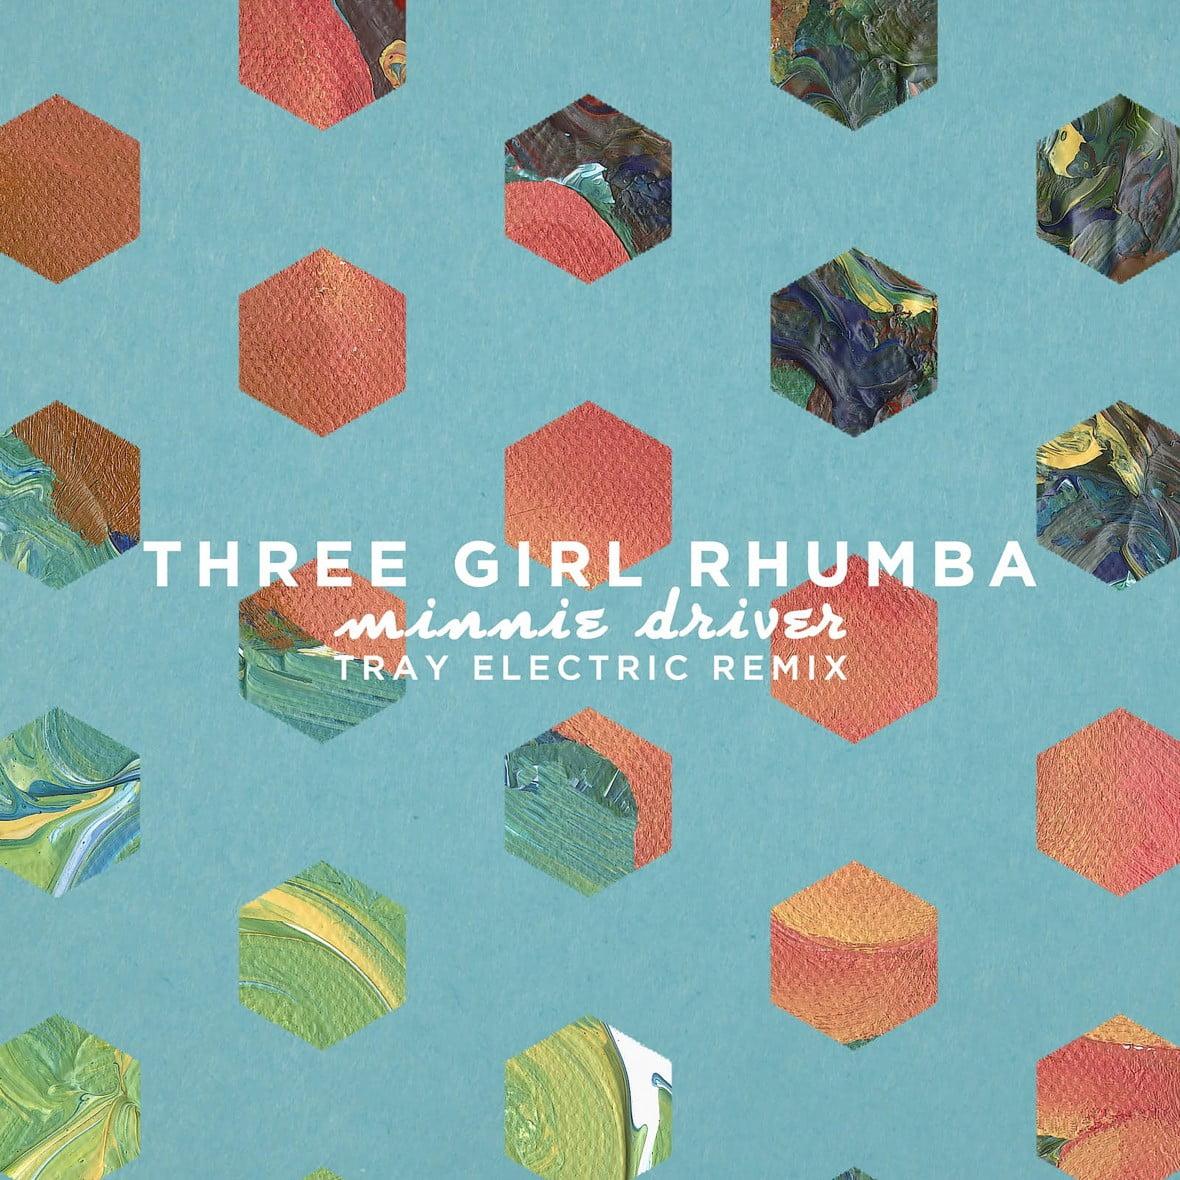 Three Girl Rhumba - Minnie Driver (Tray Electric Remix)